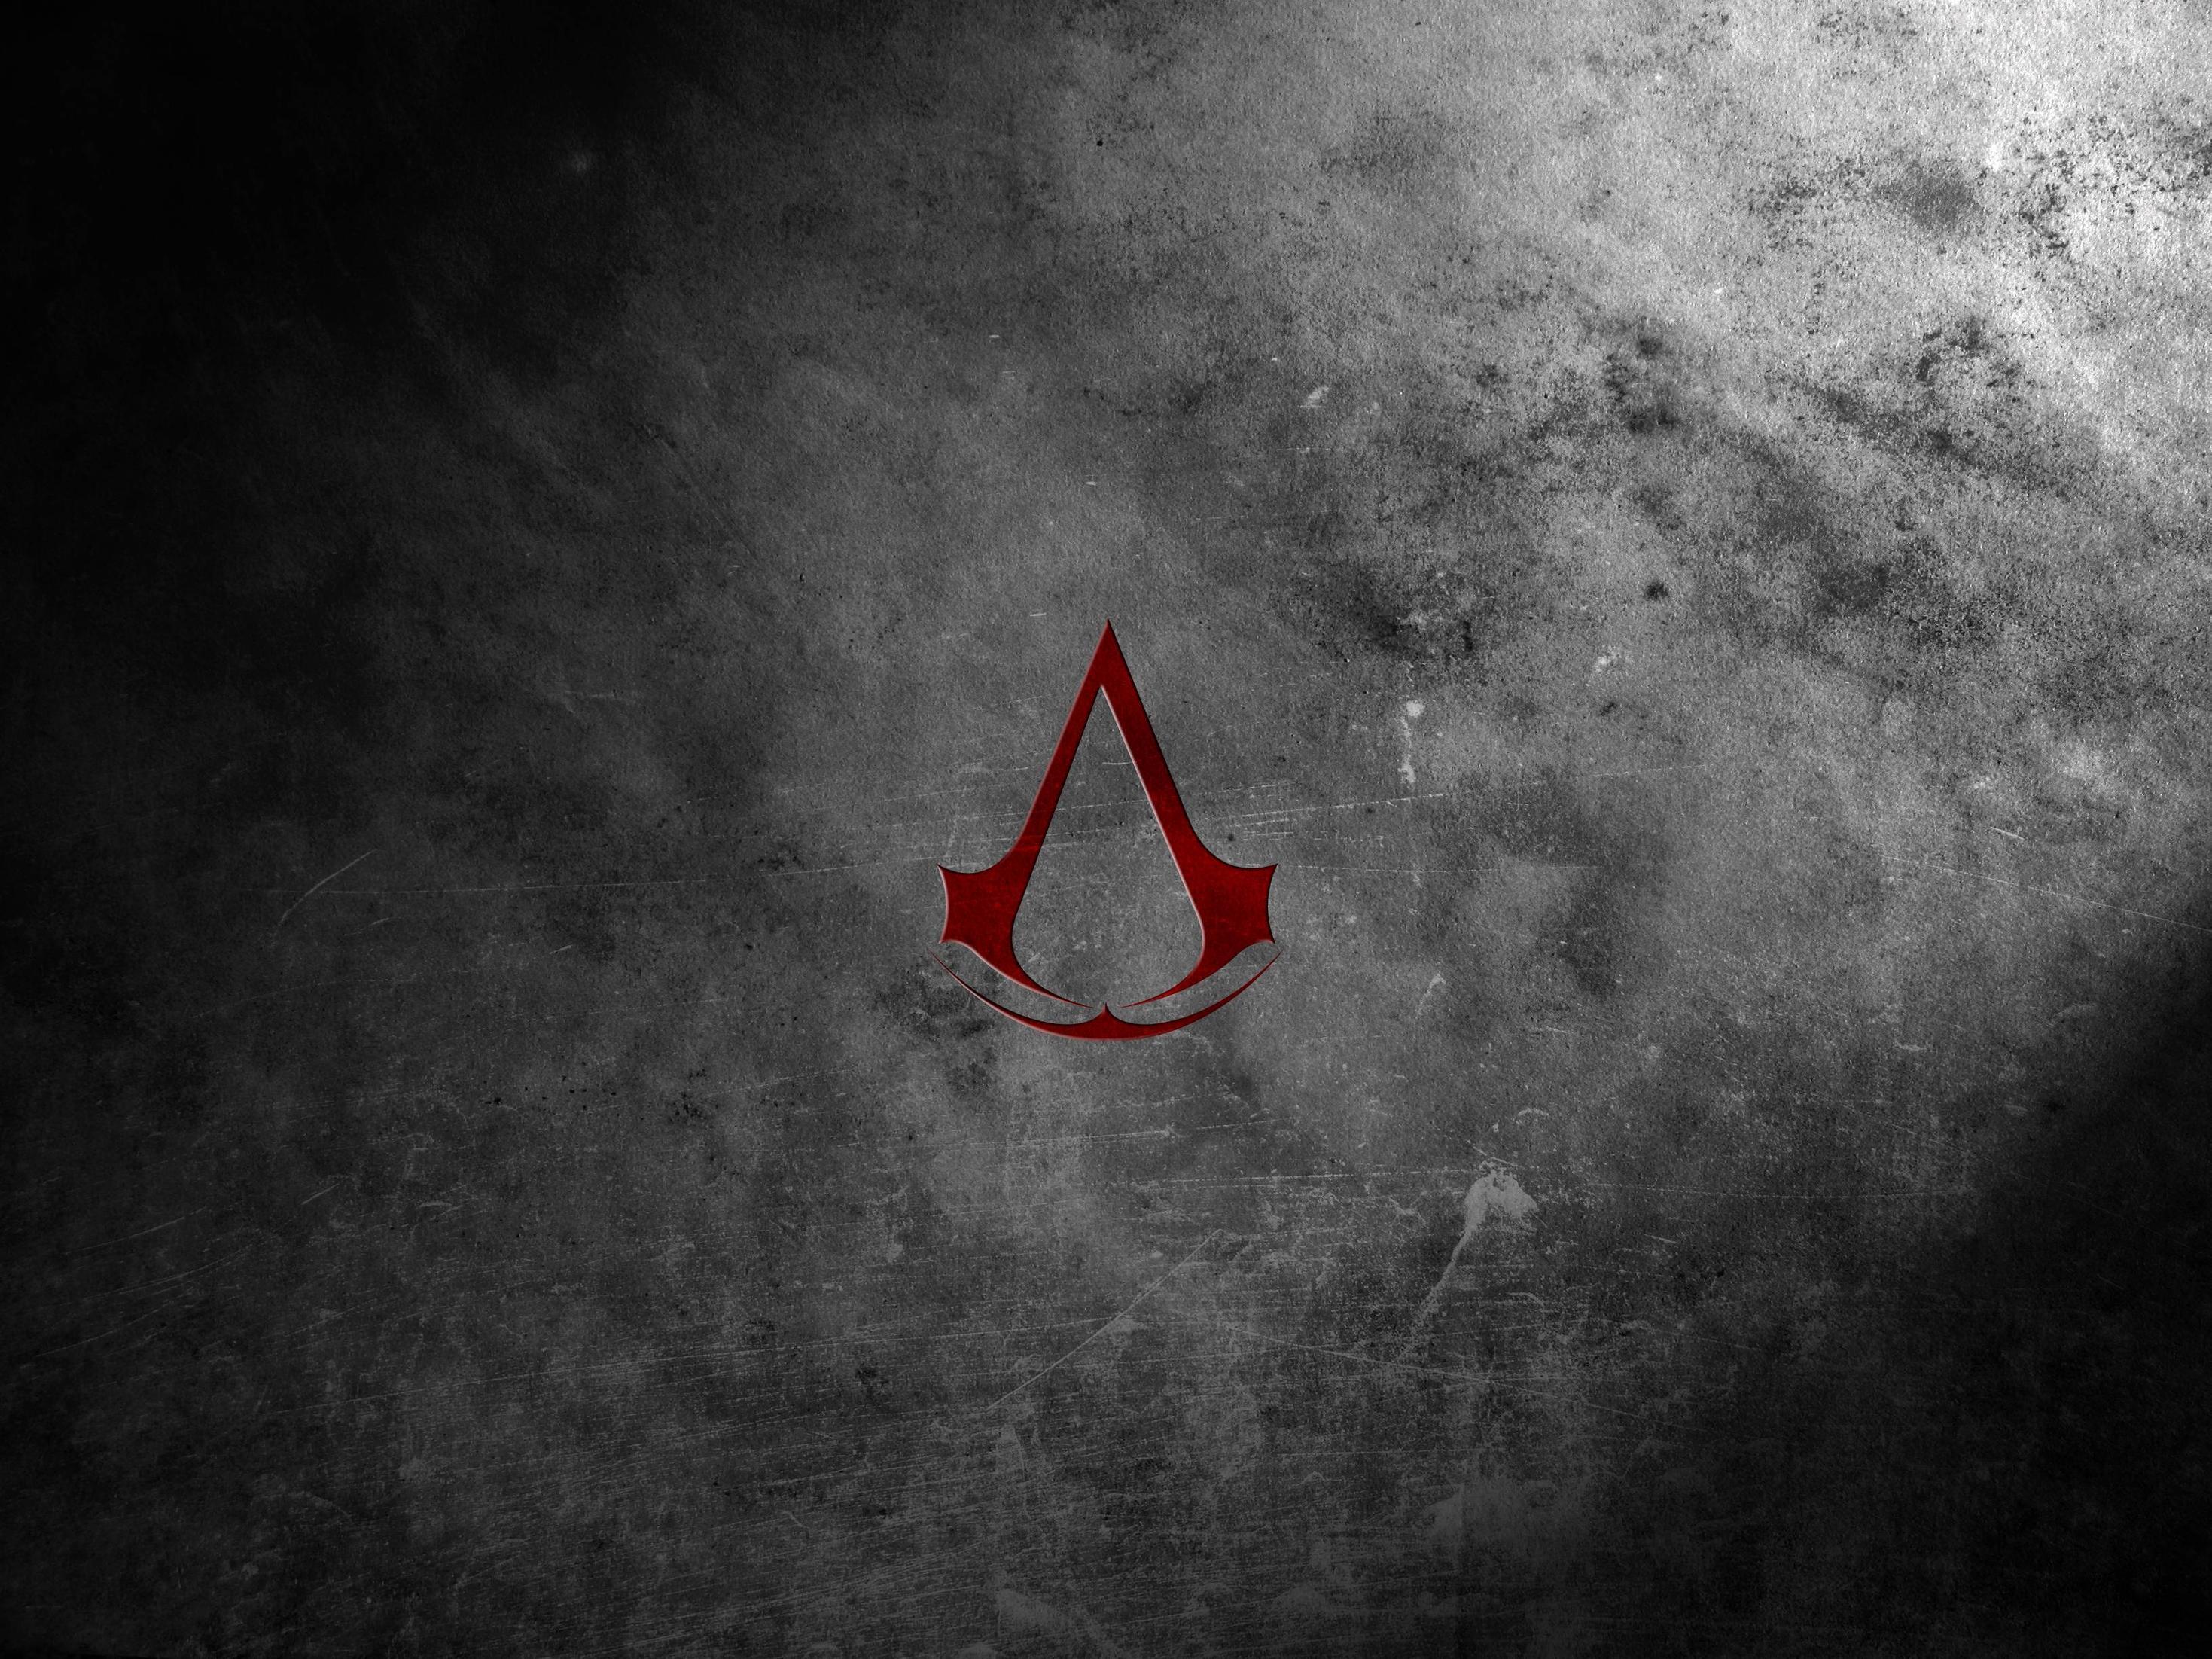 assassins creed wallpaper6 - photo #40